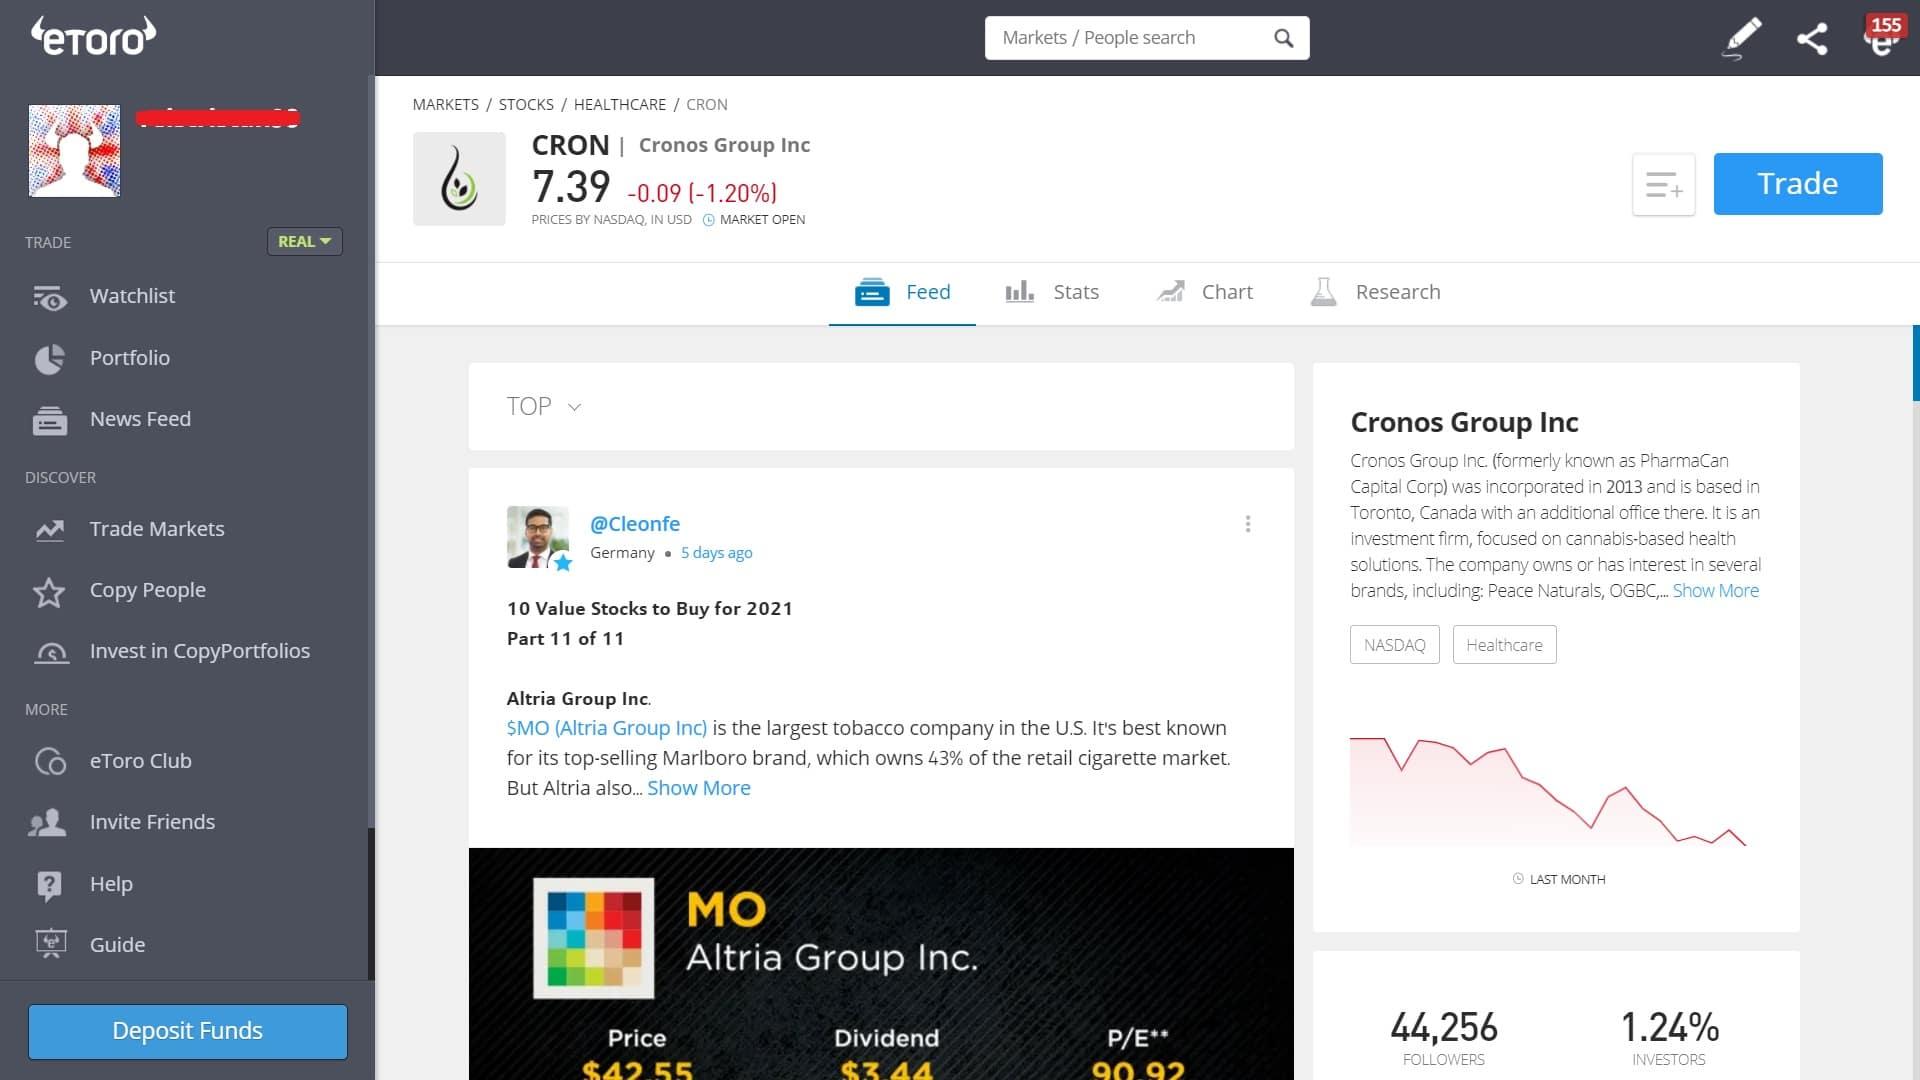 Cronos stock trading on eToro's platform